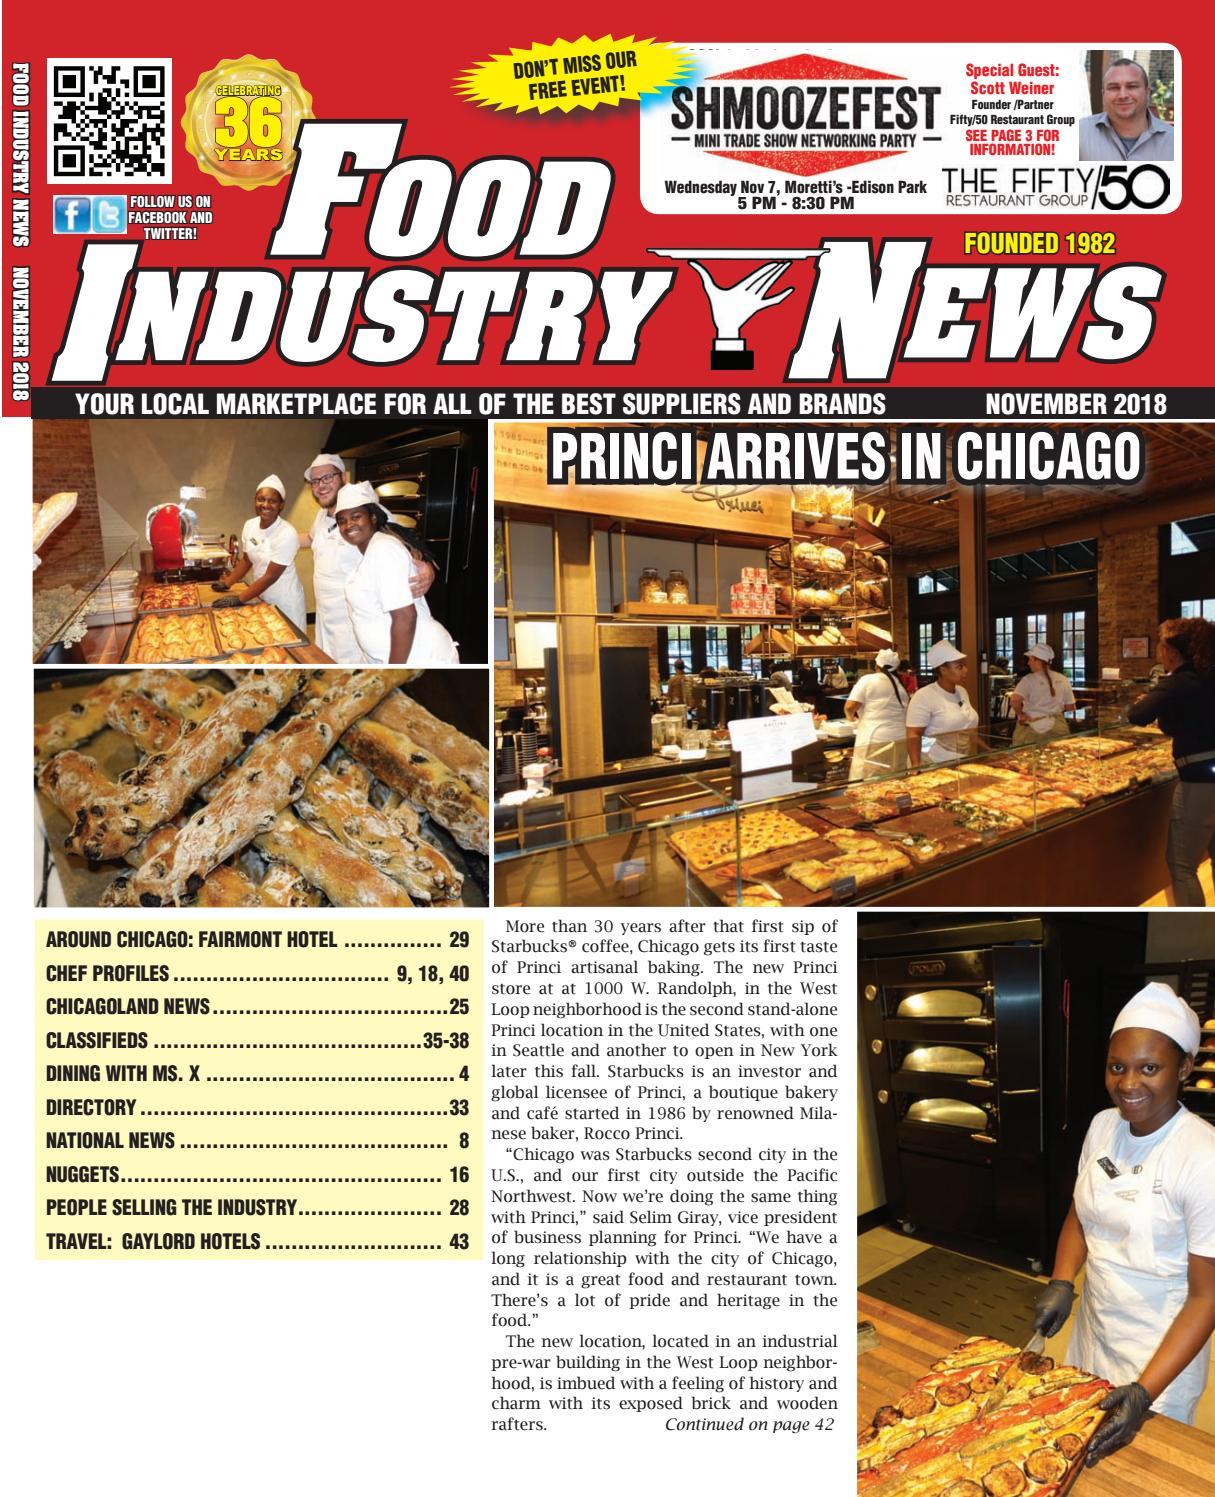 Food Industry News November 2018 web edition